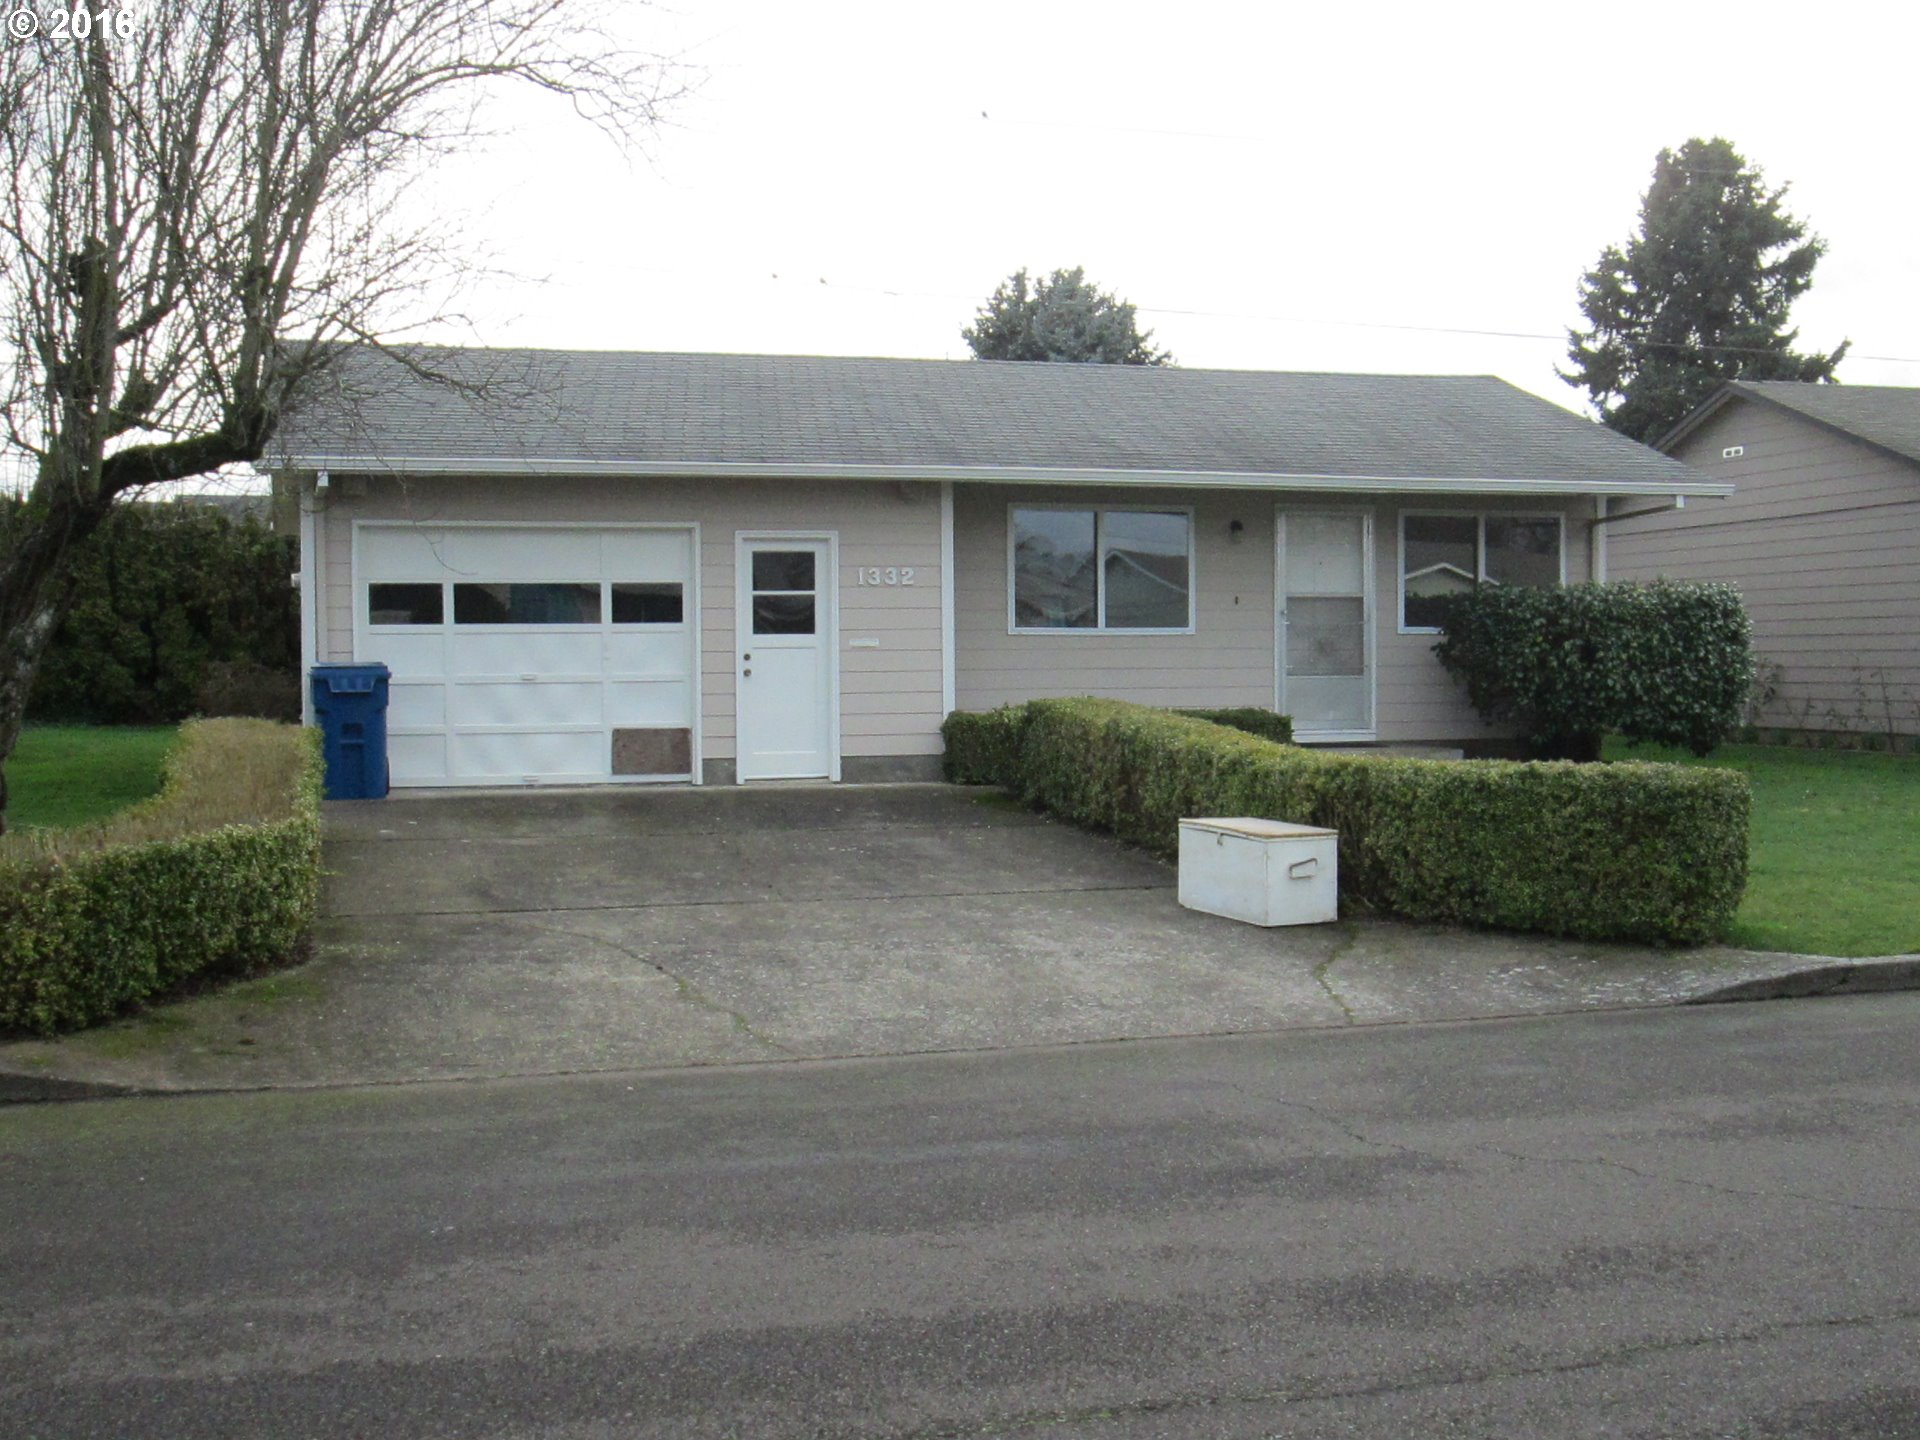 1332 Thompson Rd, Woodburn, OR